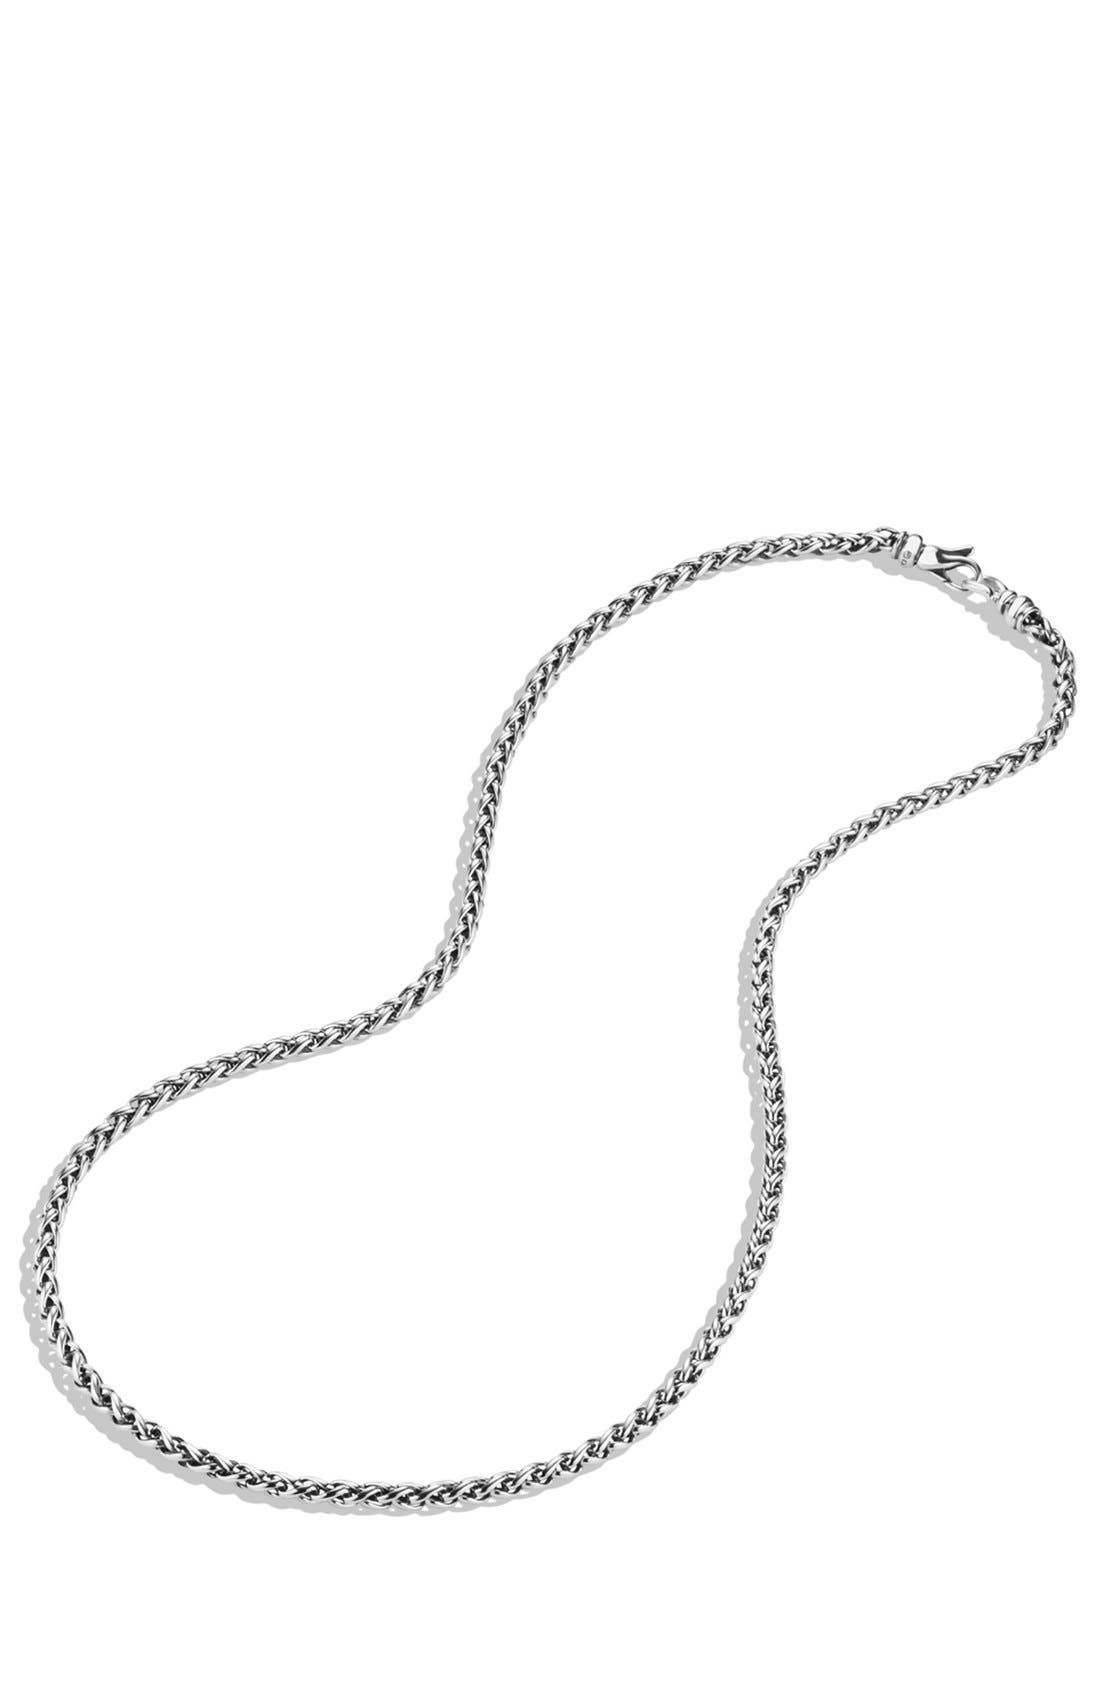 Alternate Image 2  - David Yurman 'Chain' Small Wheat Chain Necklace